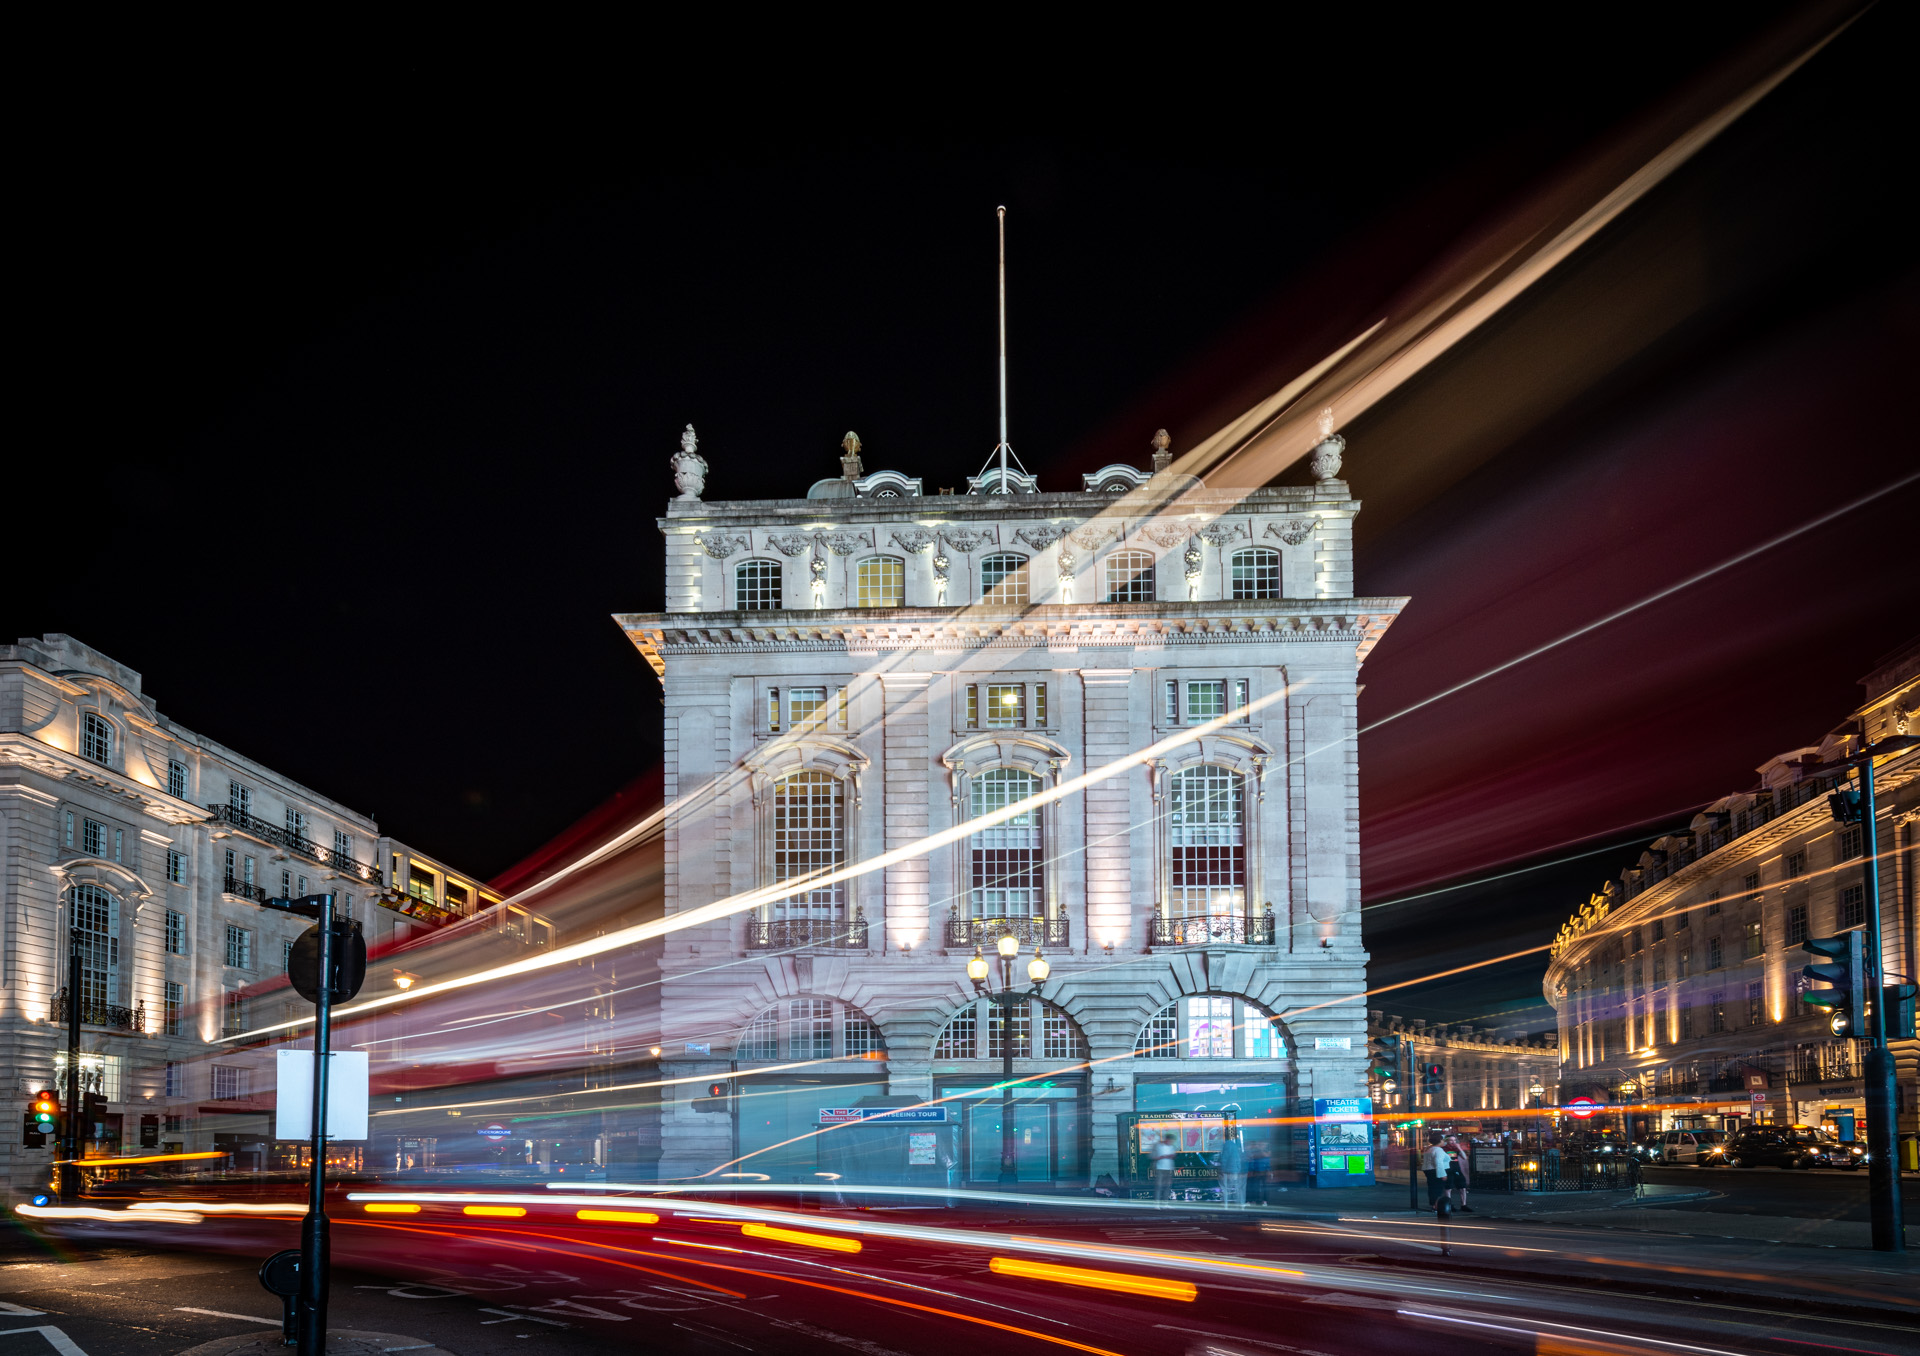 Piccadilly Circus, Bill Ward